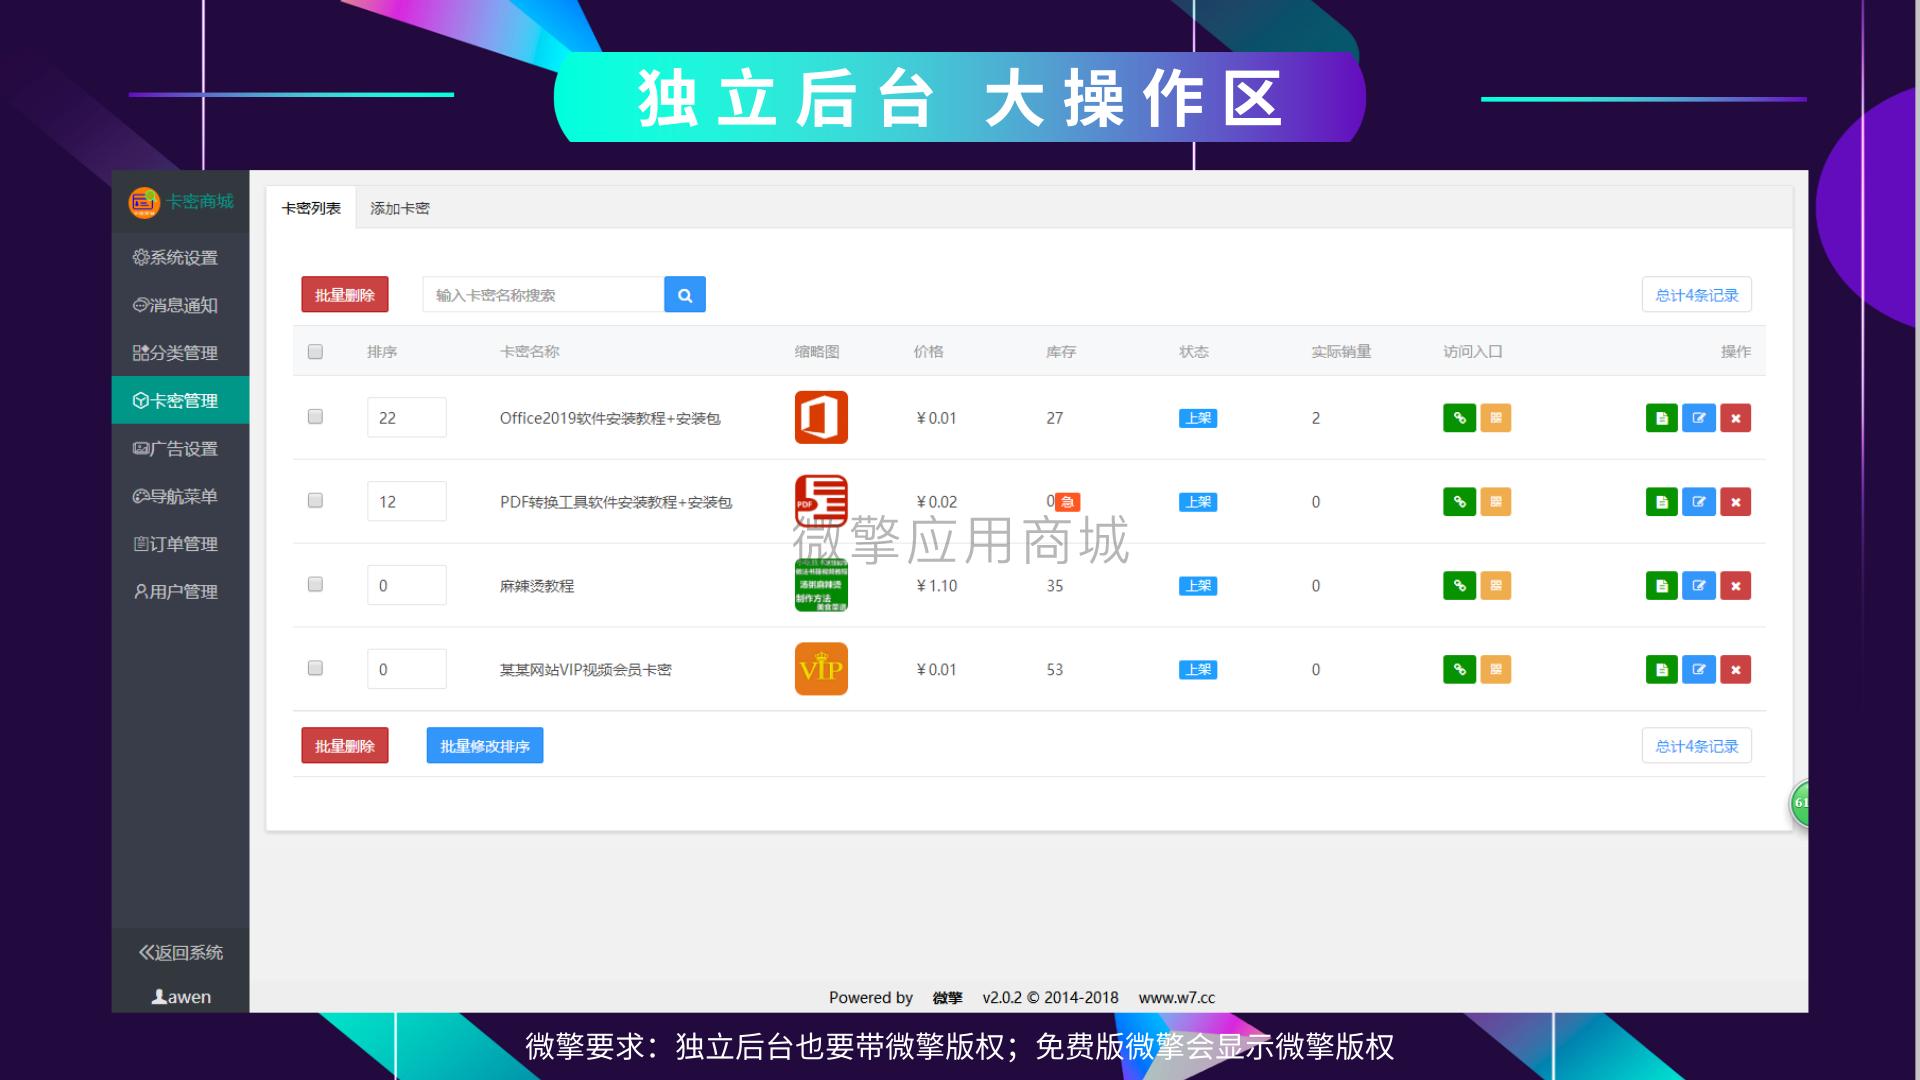 wq模块虚拟卡密发卡商城V1.1.7-渔枫源码分享网